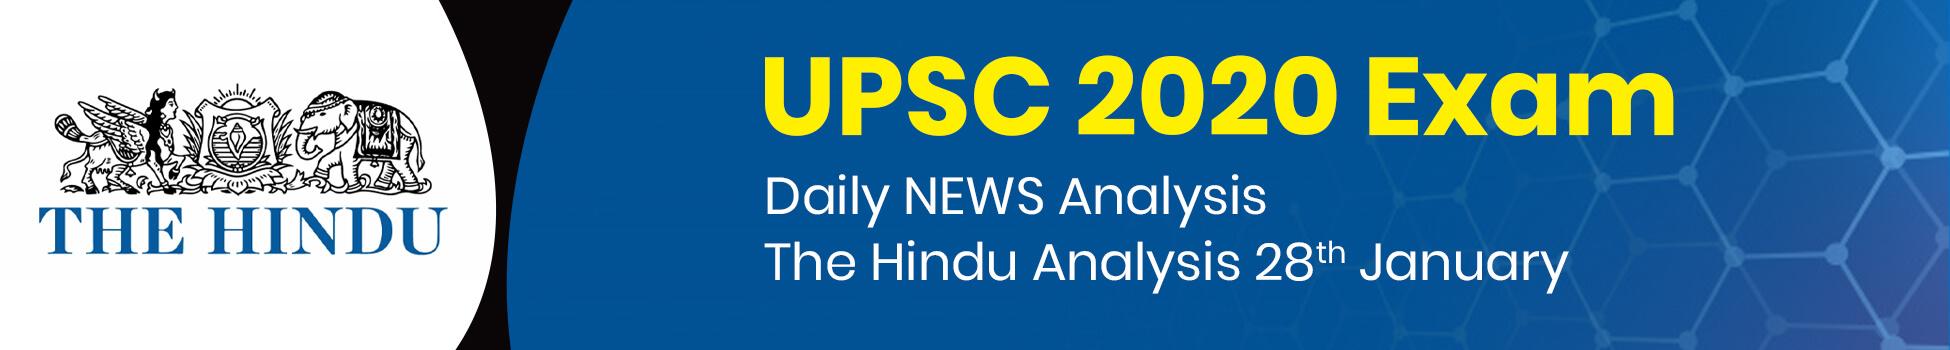 Daily NEWS Analysis | The Hindu Analysis 28th January | UPSC 2020 Exam